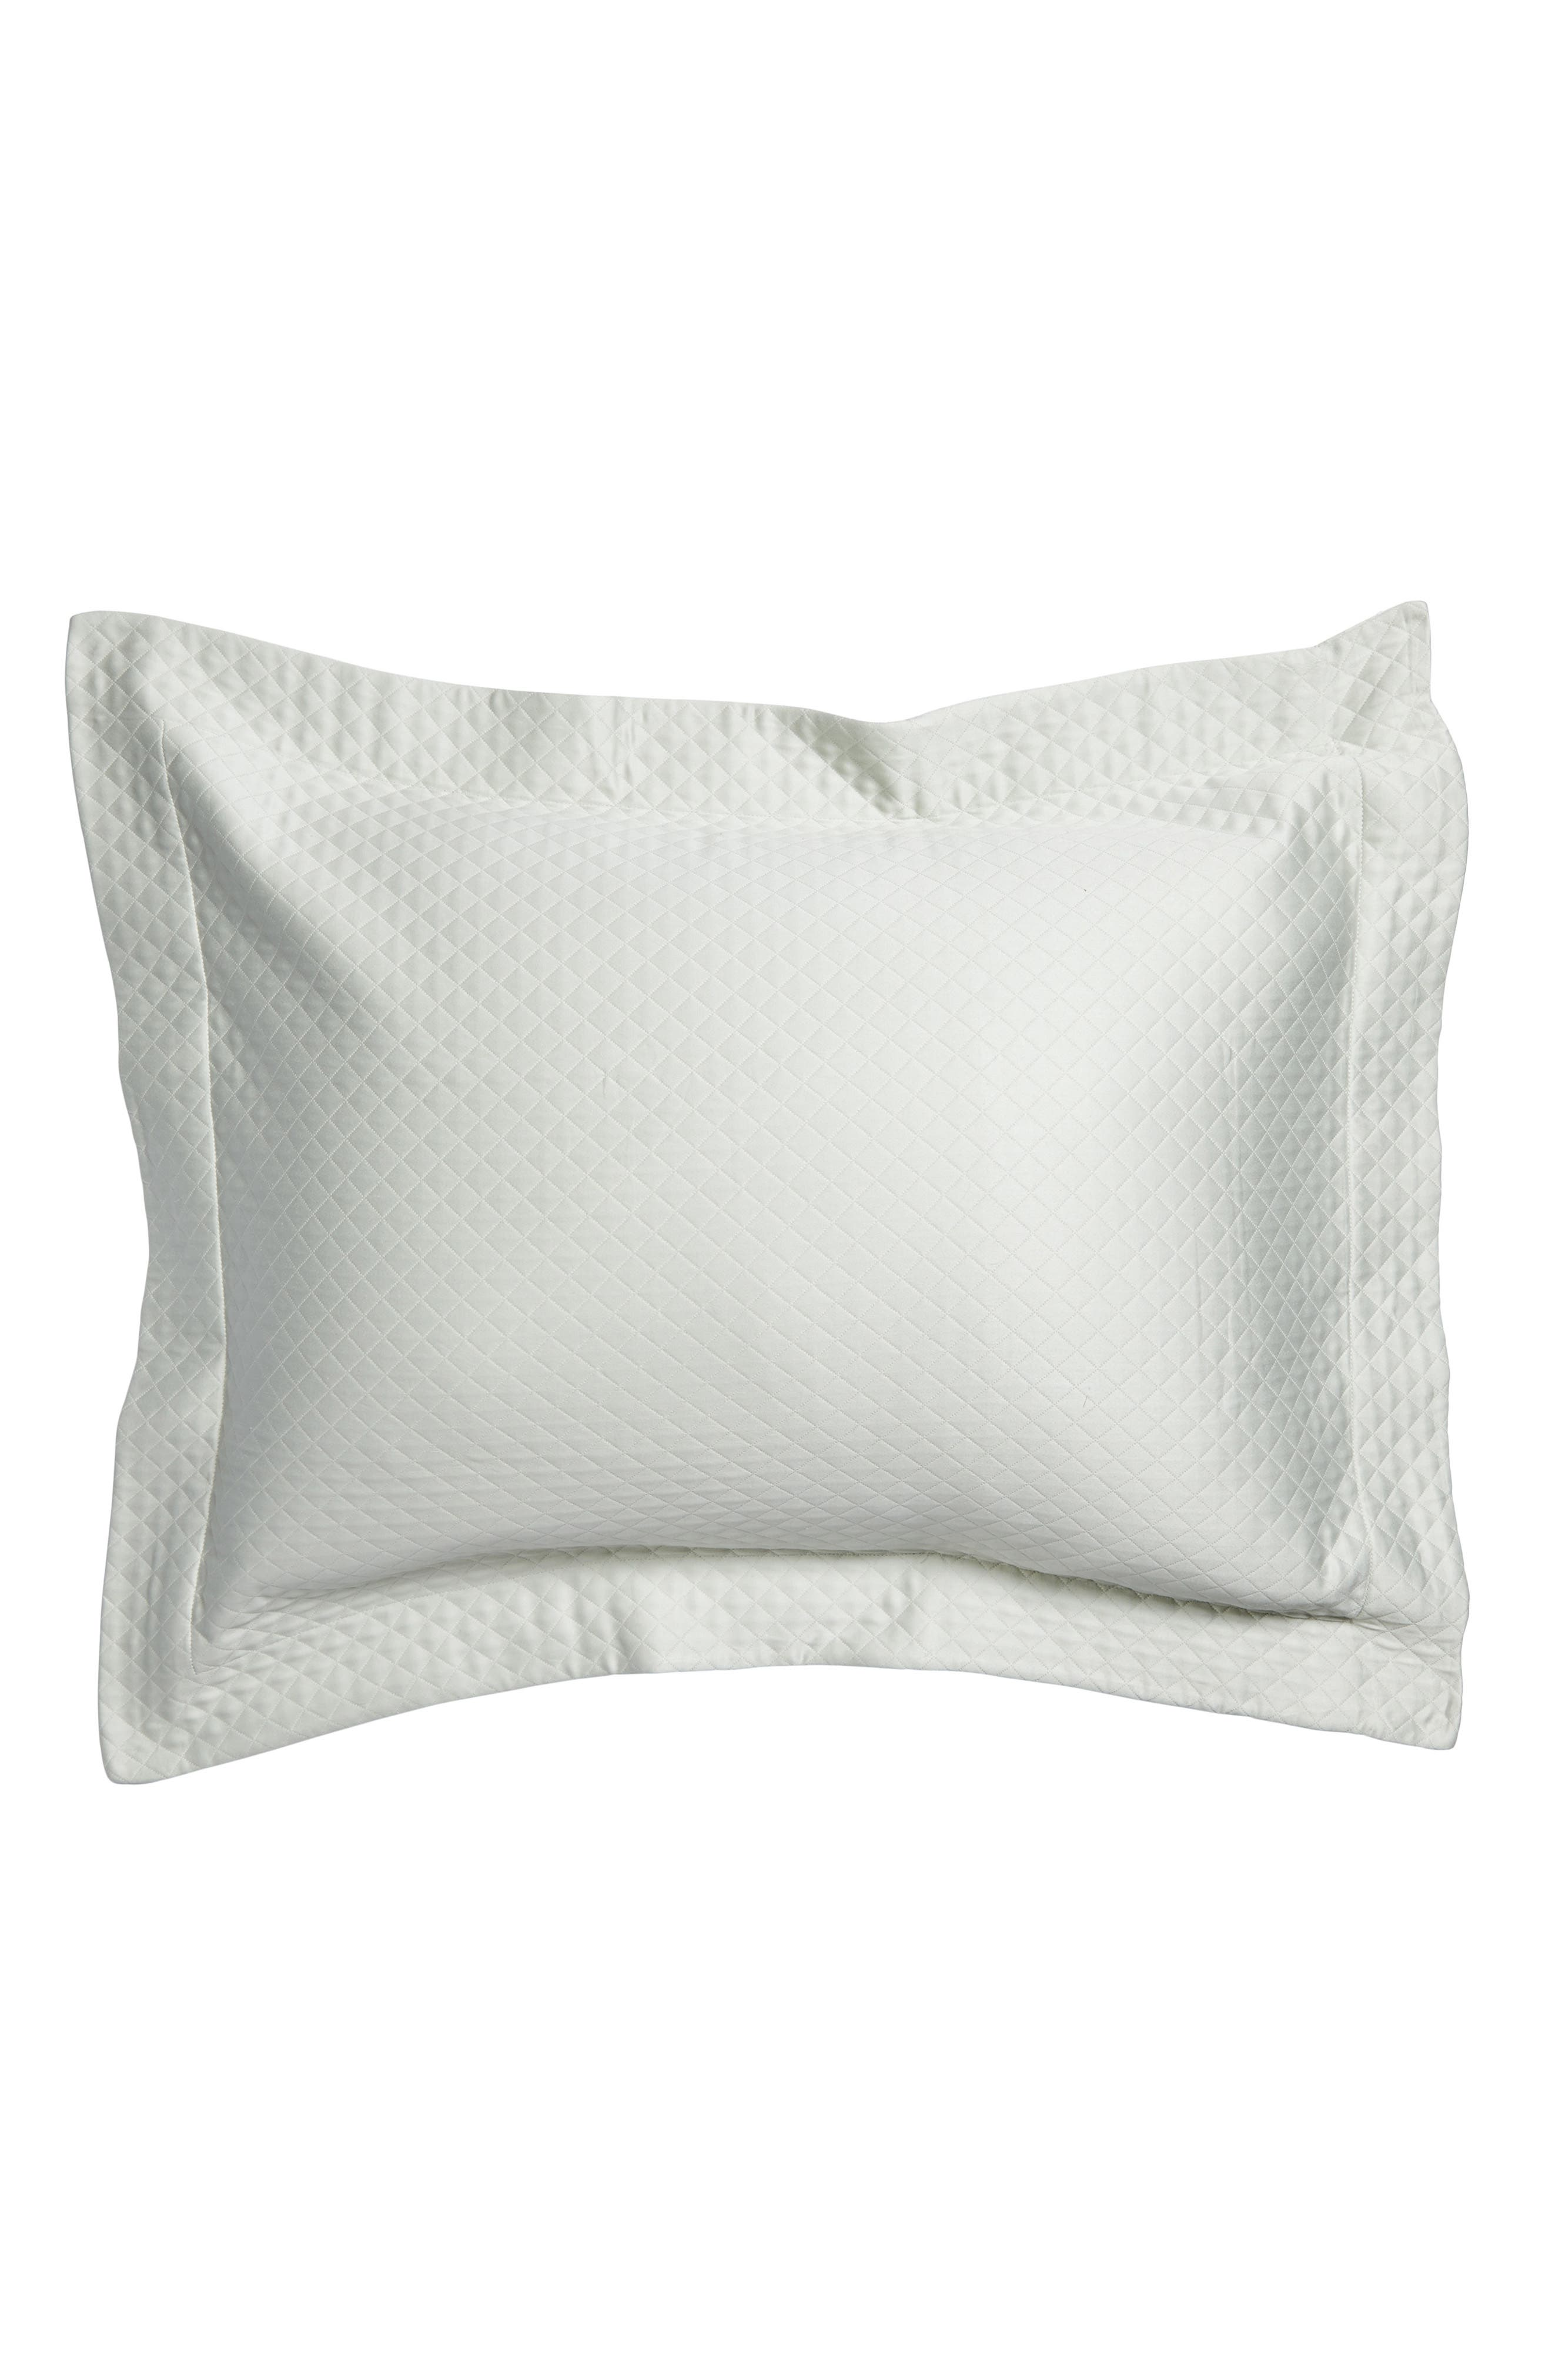 Bari Cotton Sham,                         Main,                         color, Silversage